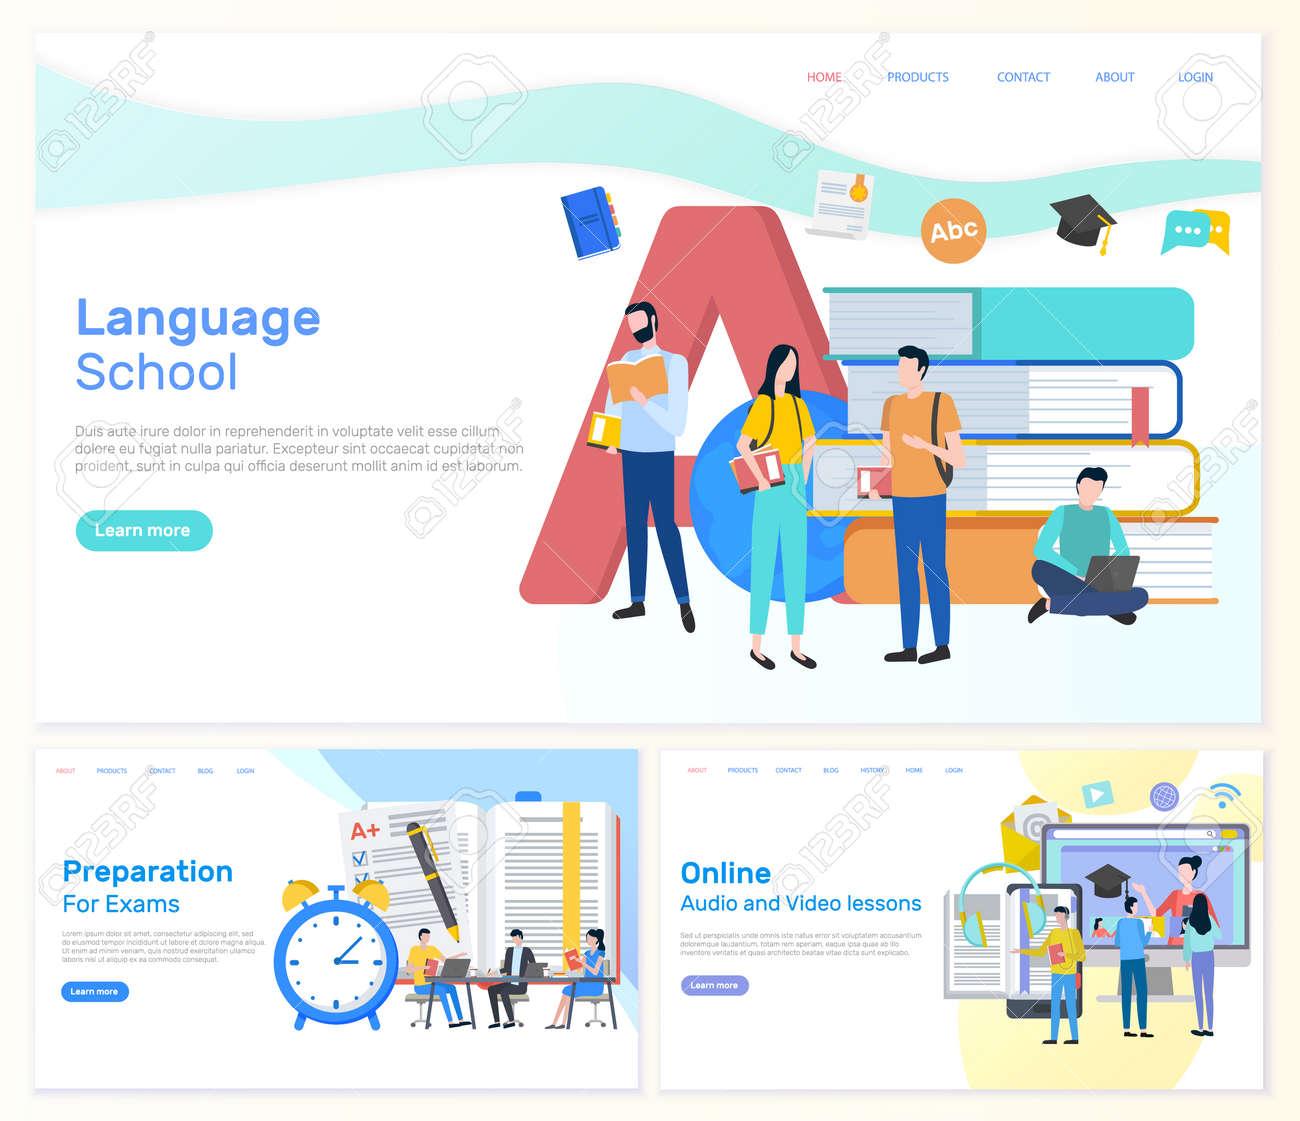 Language School, Preparation for Exams Students - 113673107